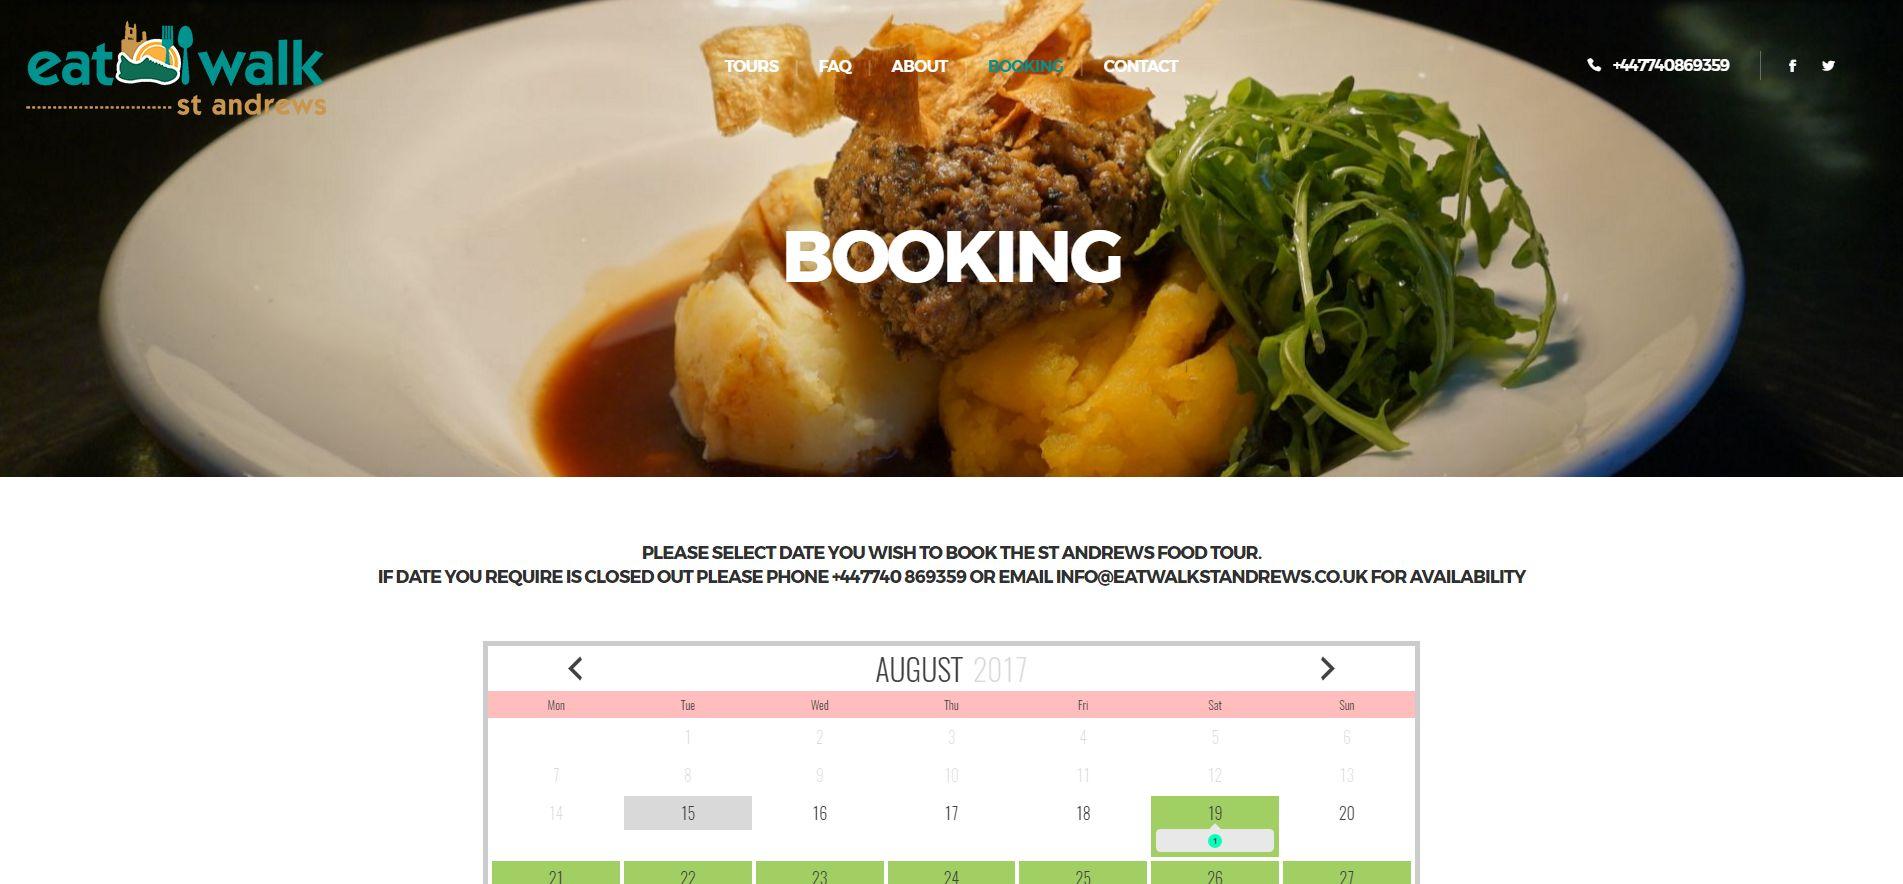 Booking-Eat-Walk-St-Andrews